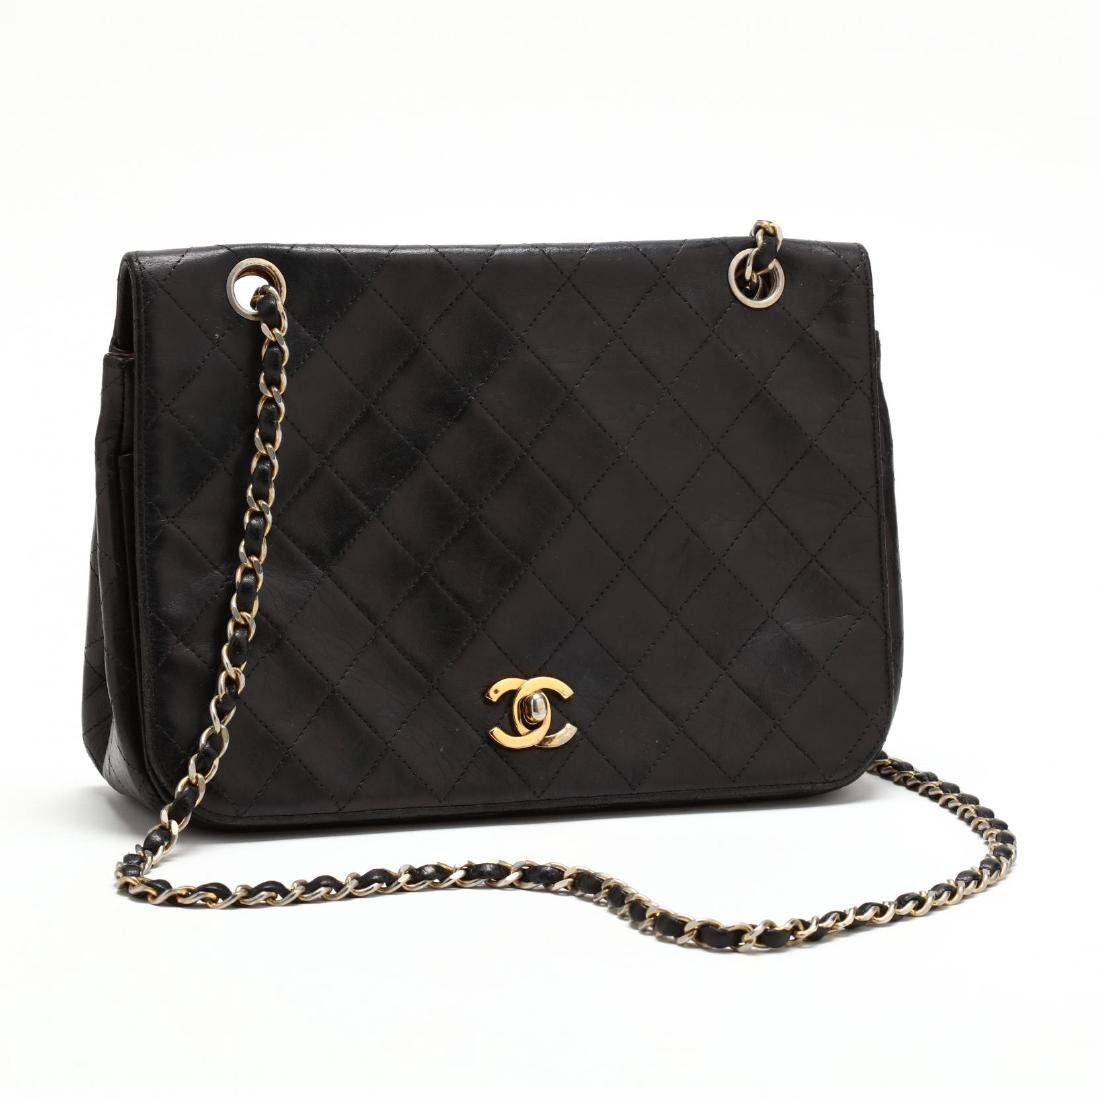 Vintage Full Flap Crossbody Bag, Chanel